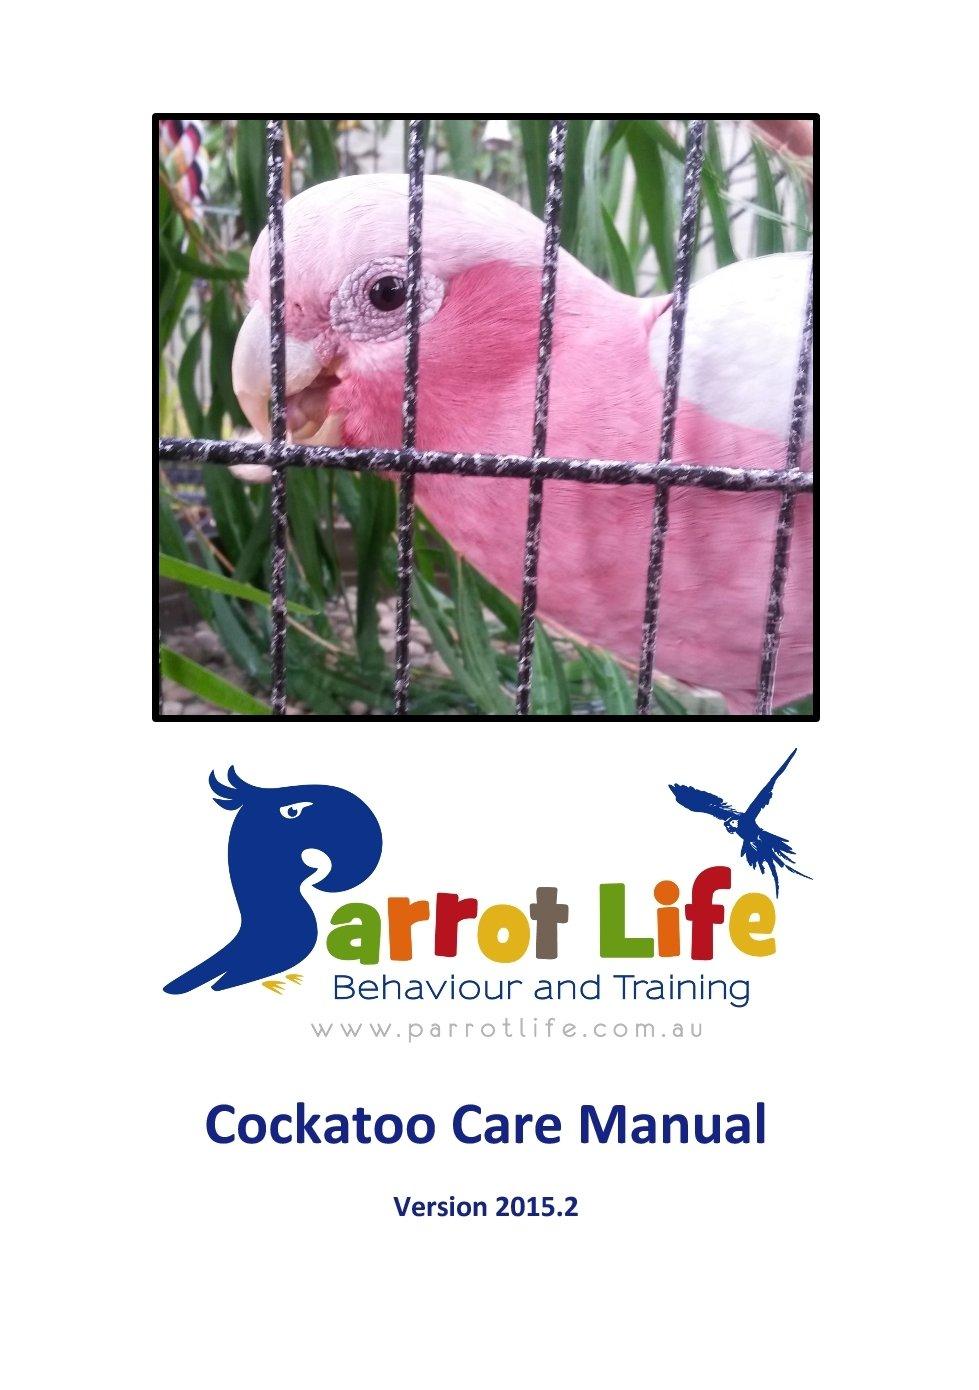 Parrot Life® Cockatoo Care Manual